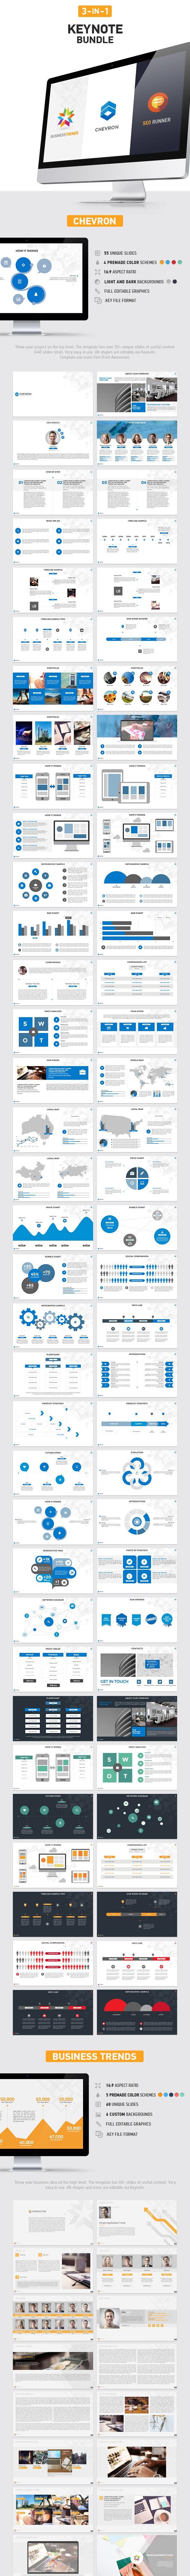 3-in-1 Keynote Bundle - Business Keynote Templates